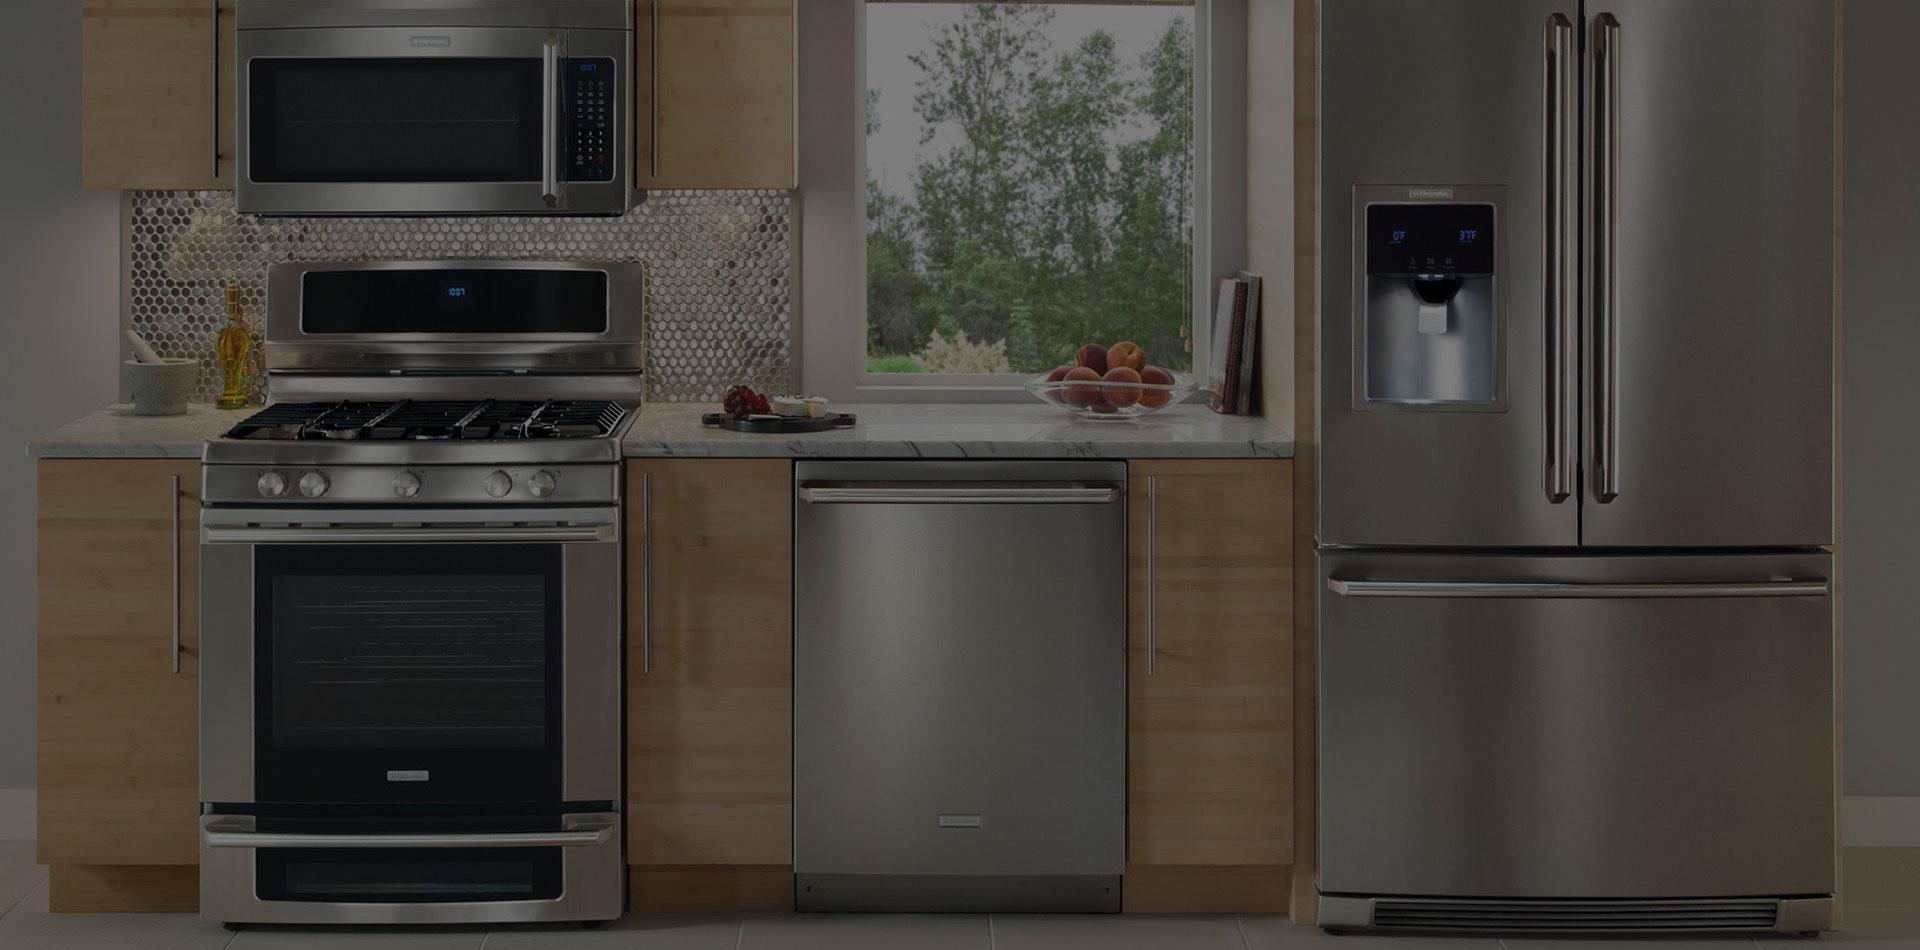 Best Appliance Repair in Orange County